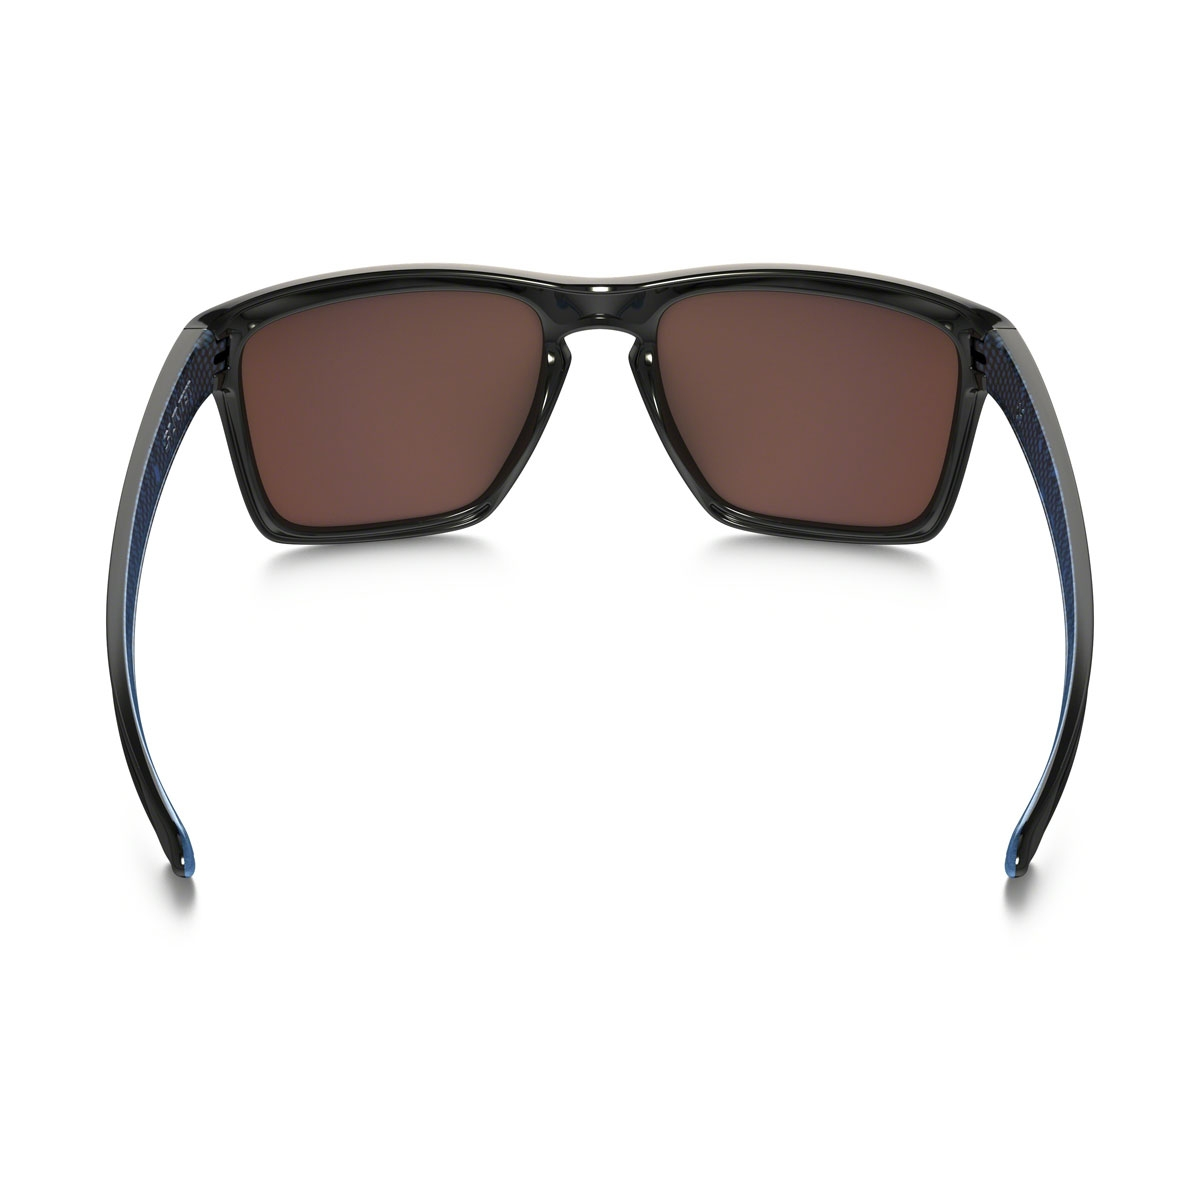 9b7534bba6c ... Image of Oakley Sliver XL Prizm Deep Water Sunglasses - Polished Black    Prizm Deep Water ...